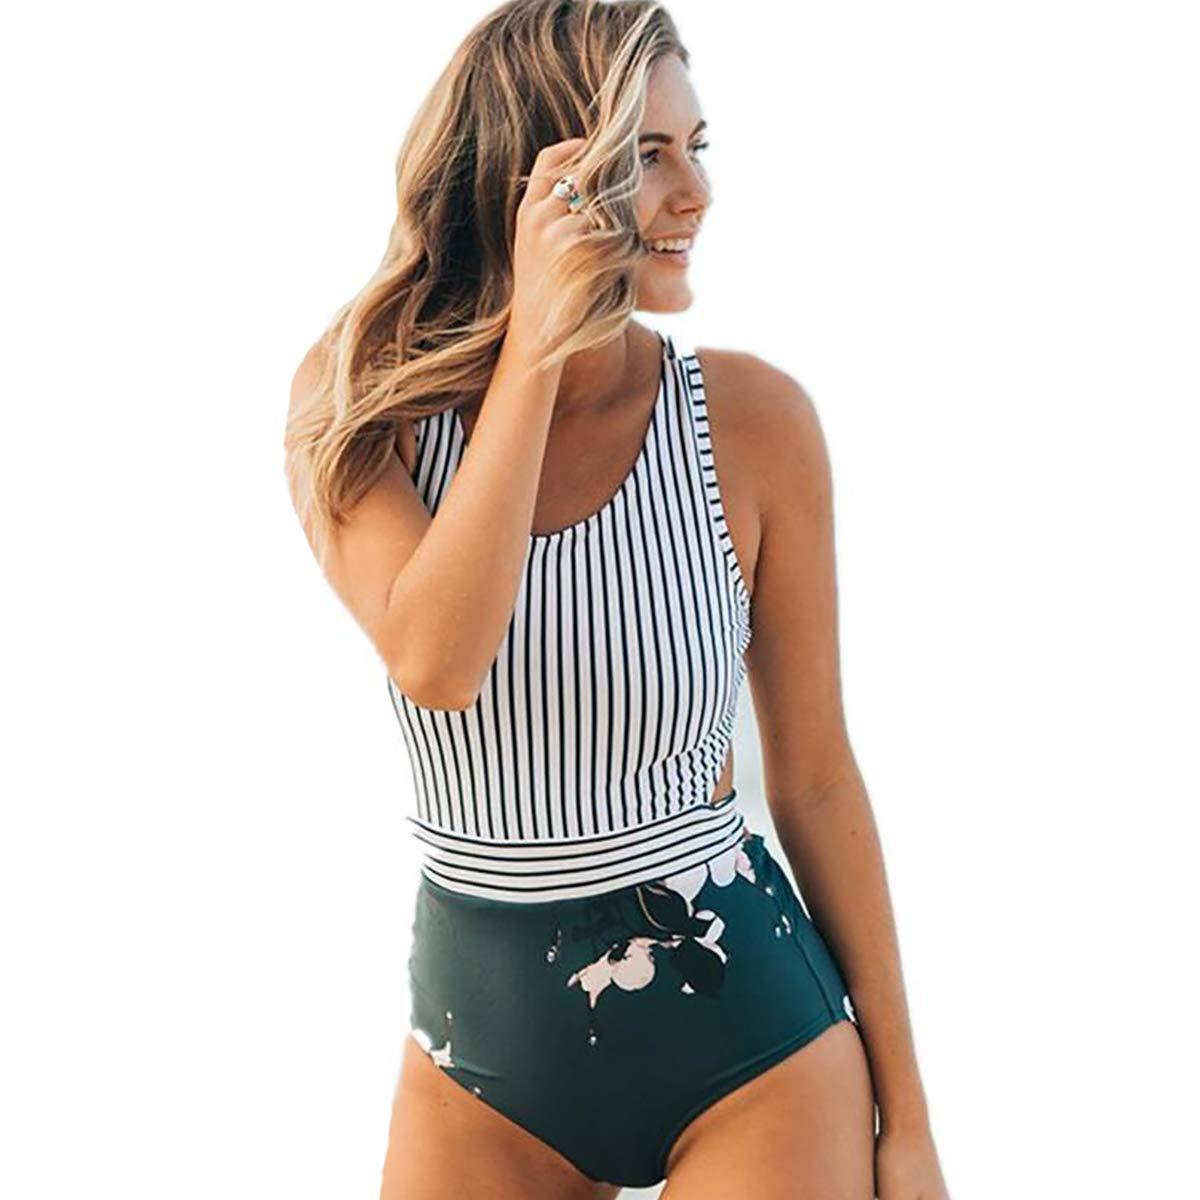 Damen Plus Size Floral Bikini Sets Gepolsterte Bademode Badeanzug Beachwear